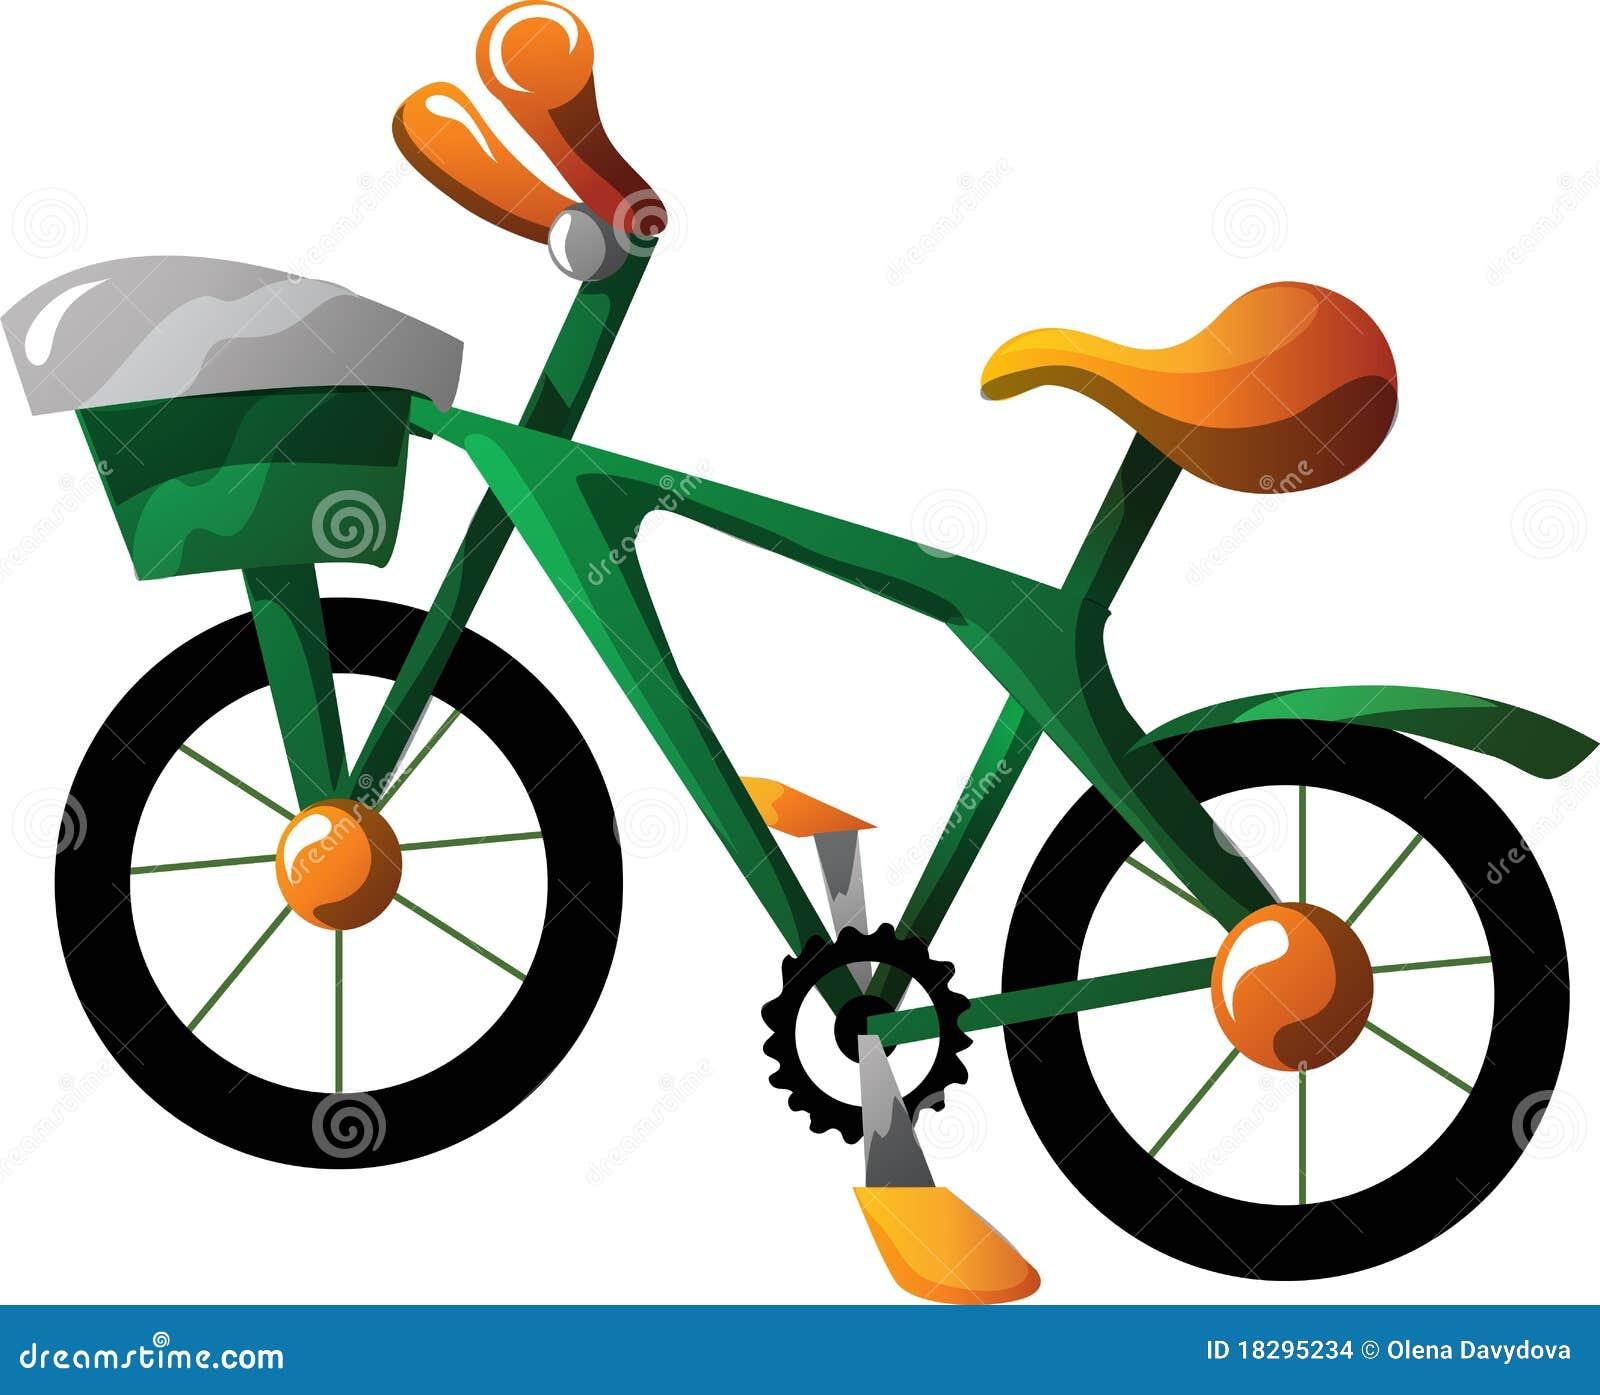 Cartoon Bike Stock Images - Image: 18295234